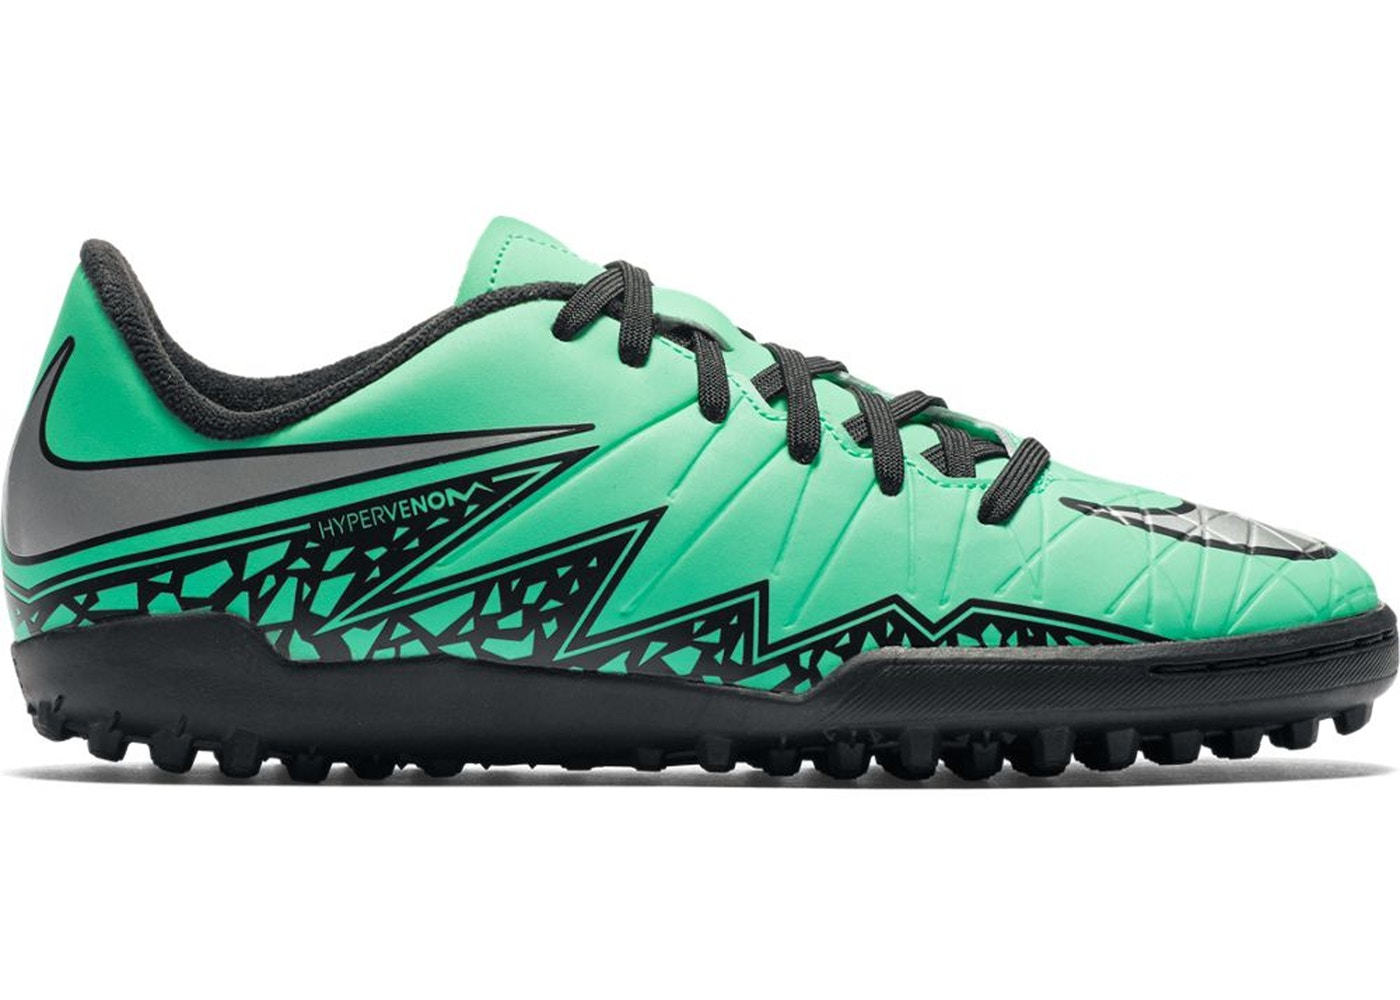 hot sale online cca35 fa751 Nike Hypervenom Phelon II TF Green Glow (GS)